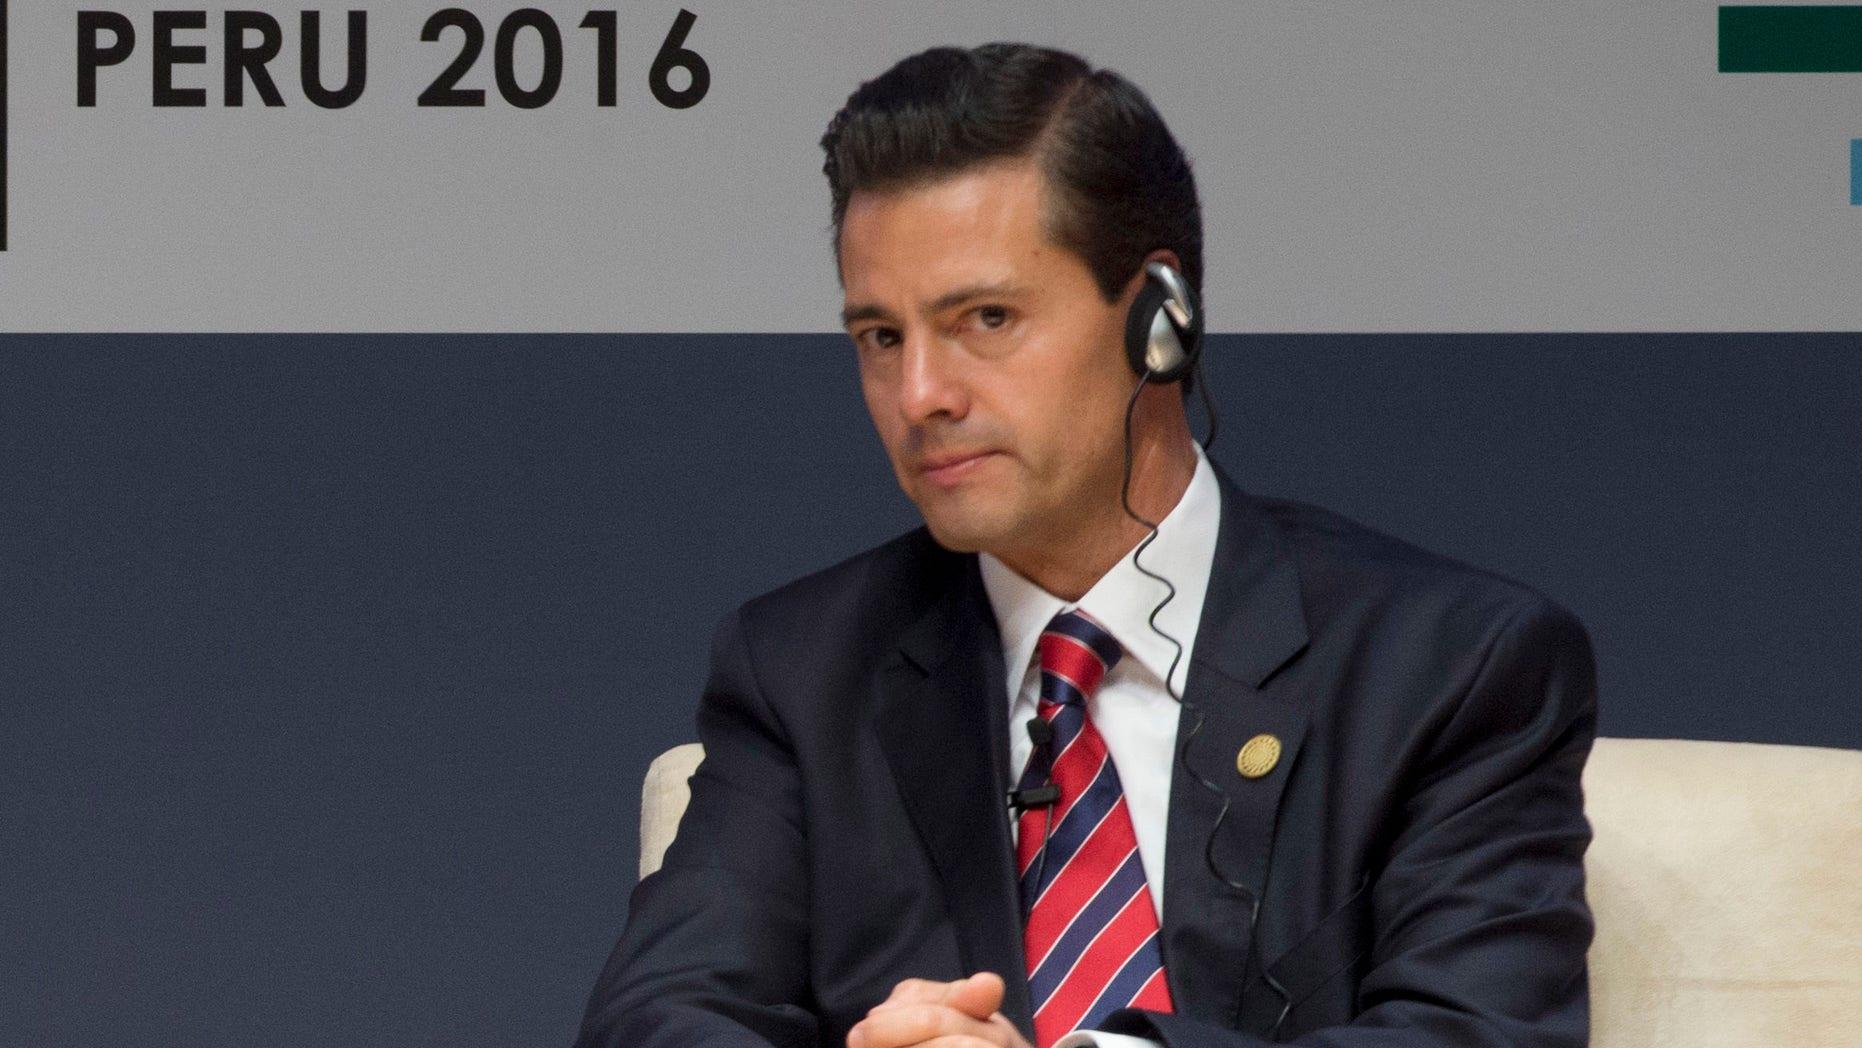 New Zealand's Prime Minister John Key, left, and Mexico's President Enrique Pena Nieto, patucipate in a forum about trade at the Asia Pacific Economic Cooperation, APEC, CEO Summit, in Lima, Peru, Saturday, Nov. 19, 2016. (AP Photo/Esteban Felix)